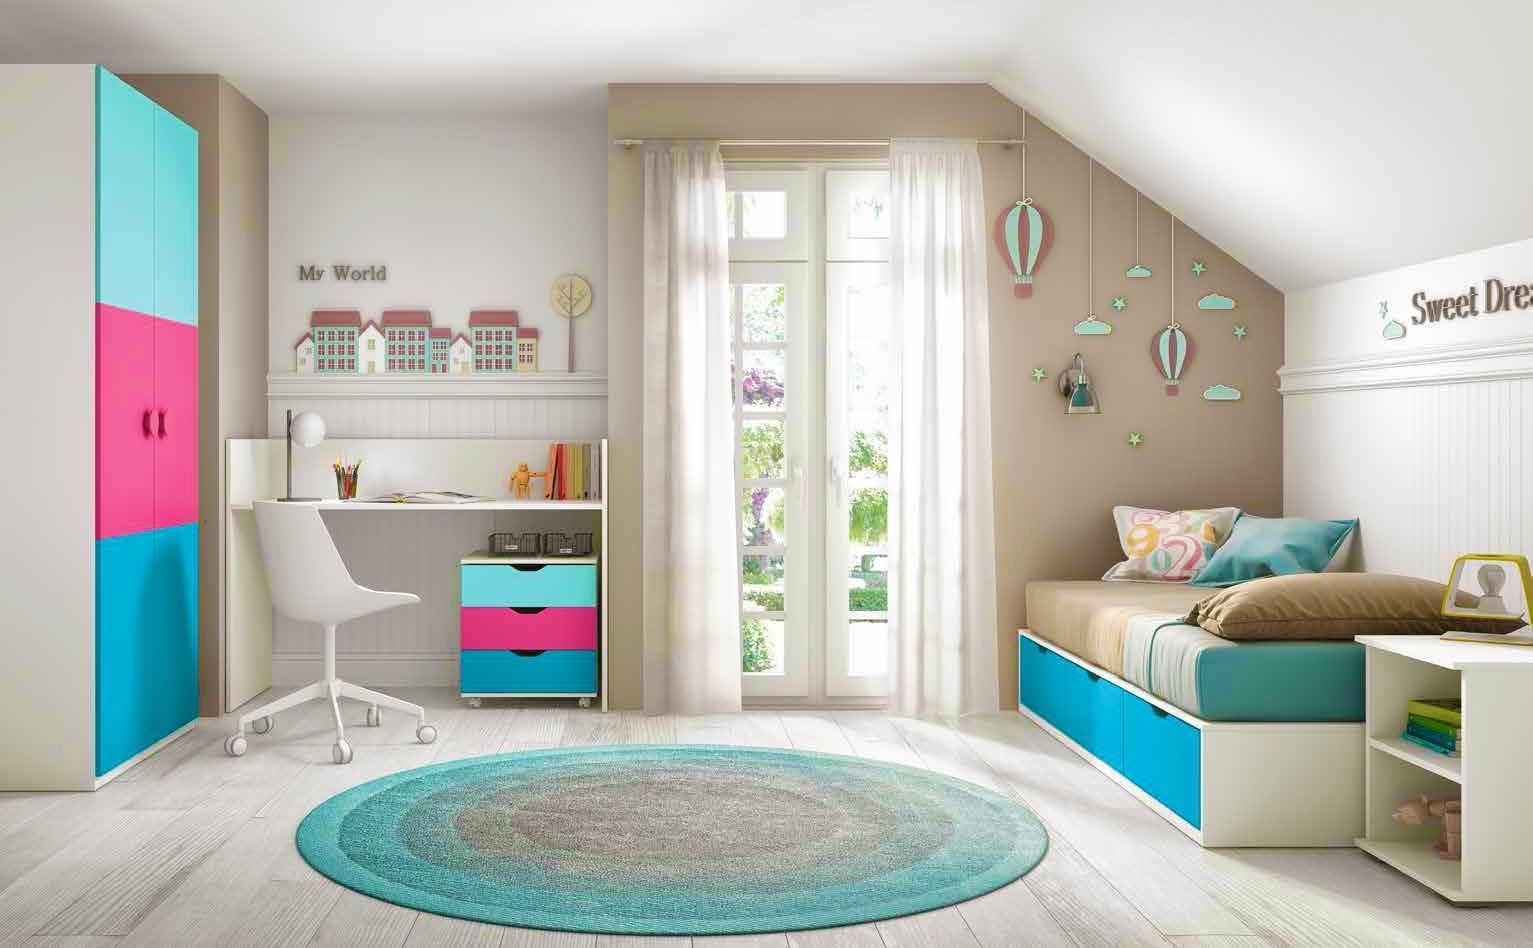 chambre de b b fille compl te avec lit volutif glicerio so nuit. Black Bedroom Furniture Sets. Home Design Ideas